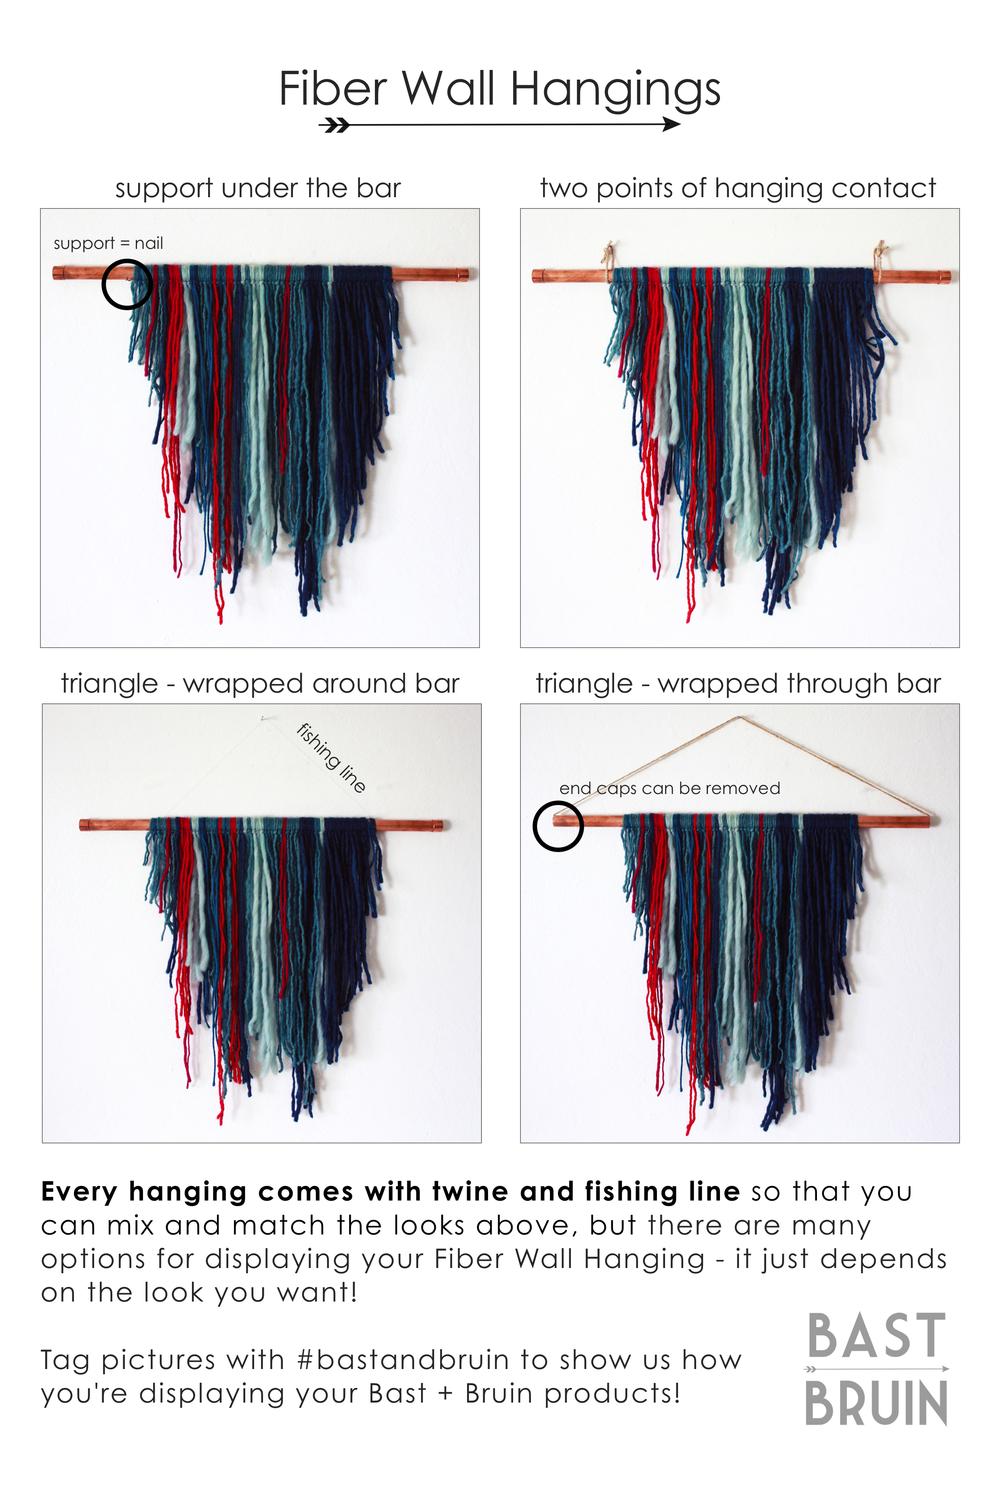 bast-bruin-fiber-hanging-1_alt4.jpeg